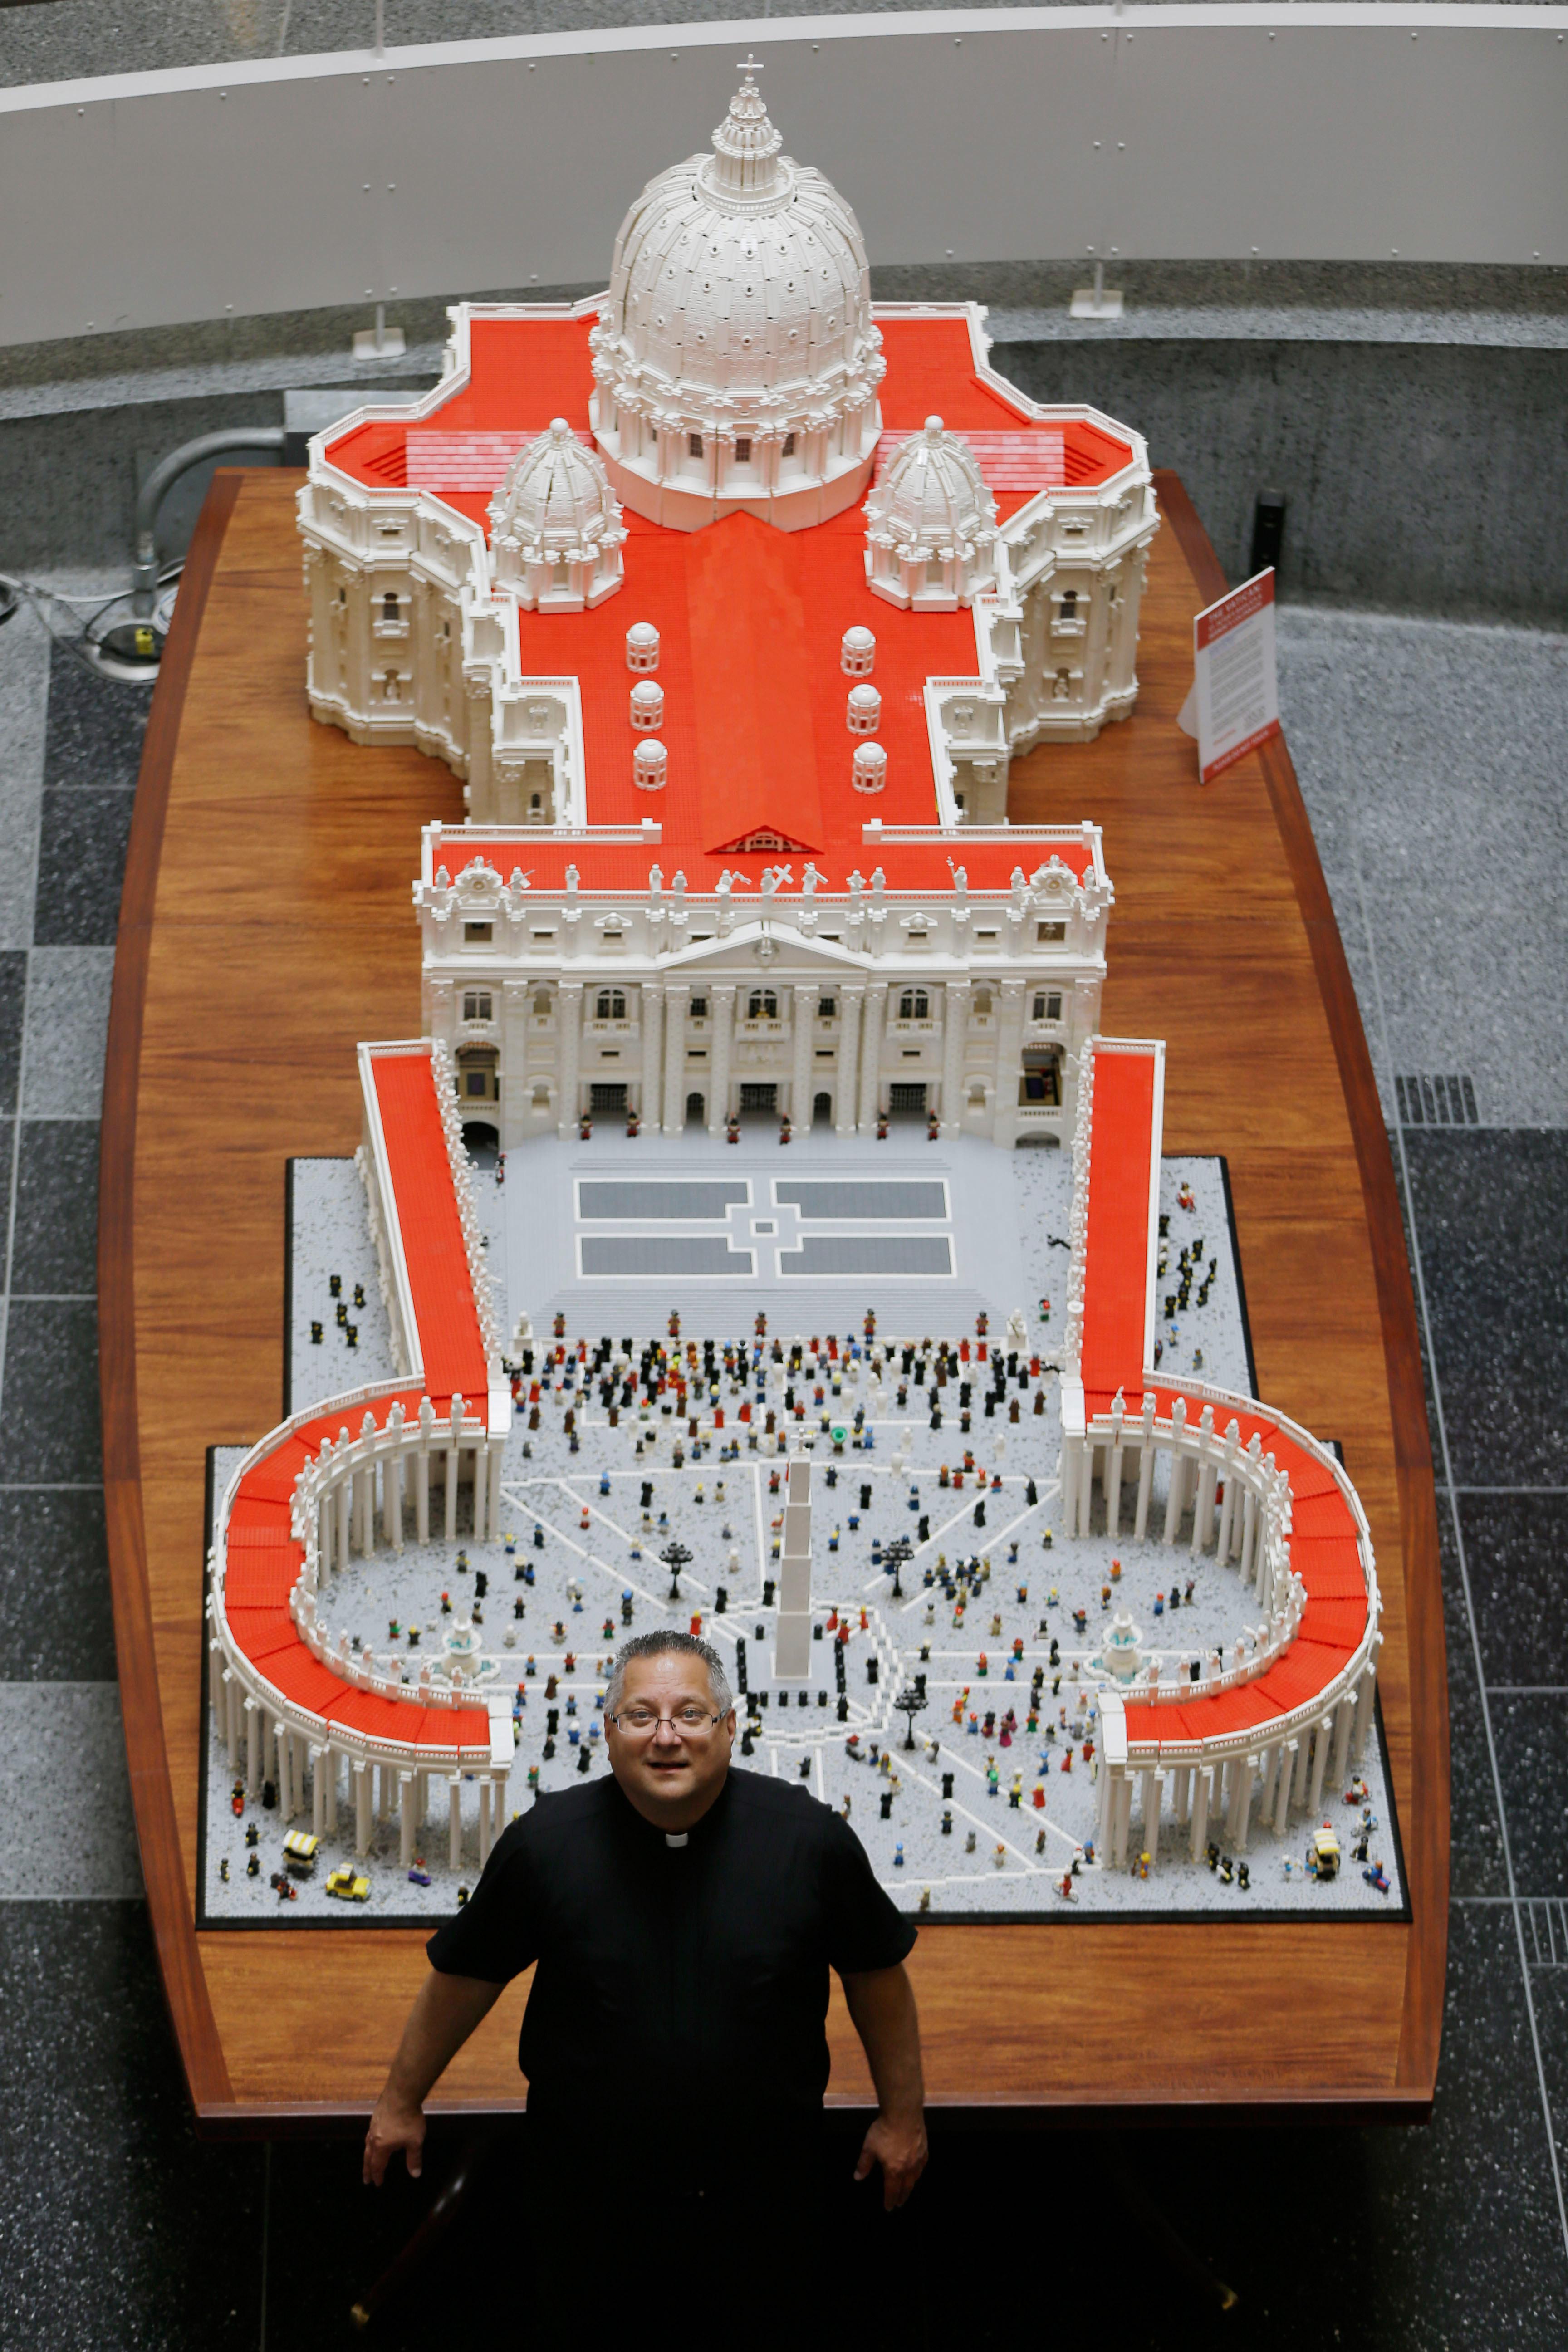 Father Bob Simon poses for a photograph with his creation.